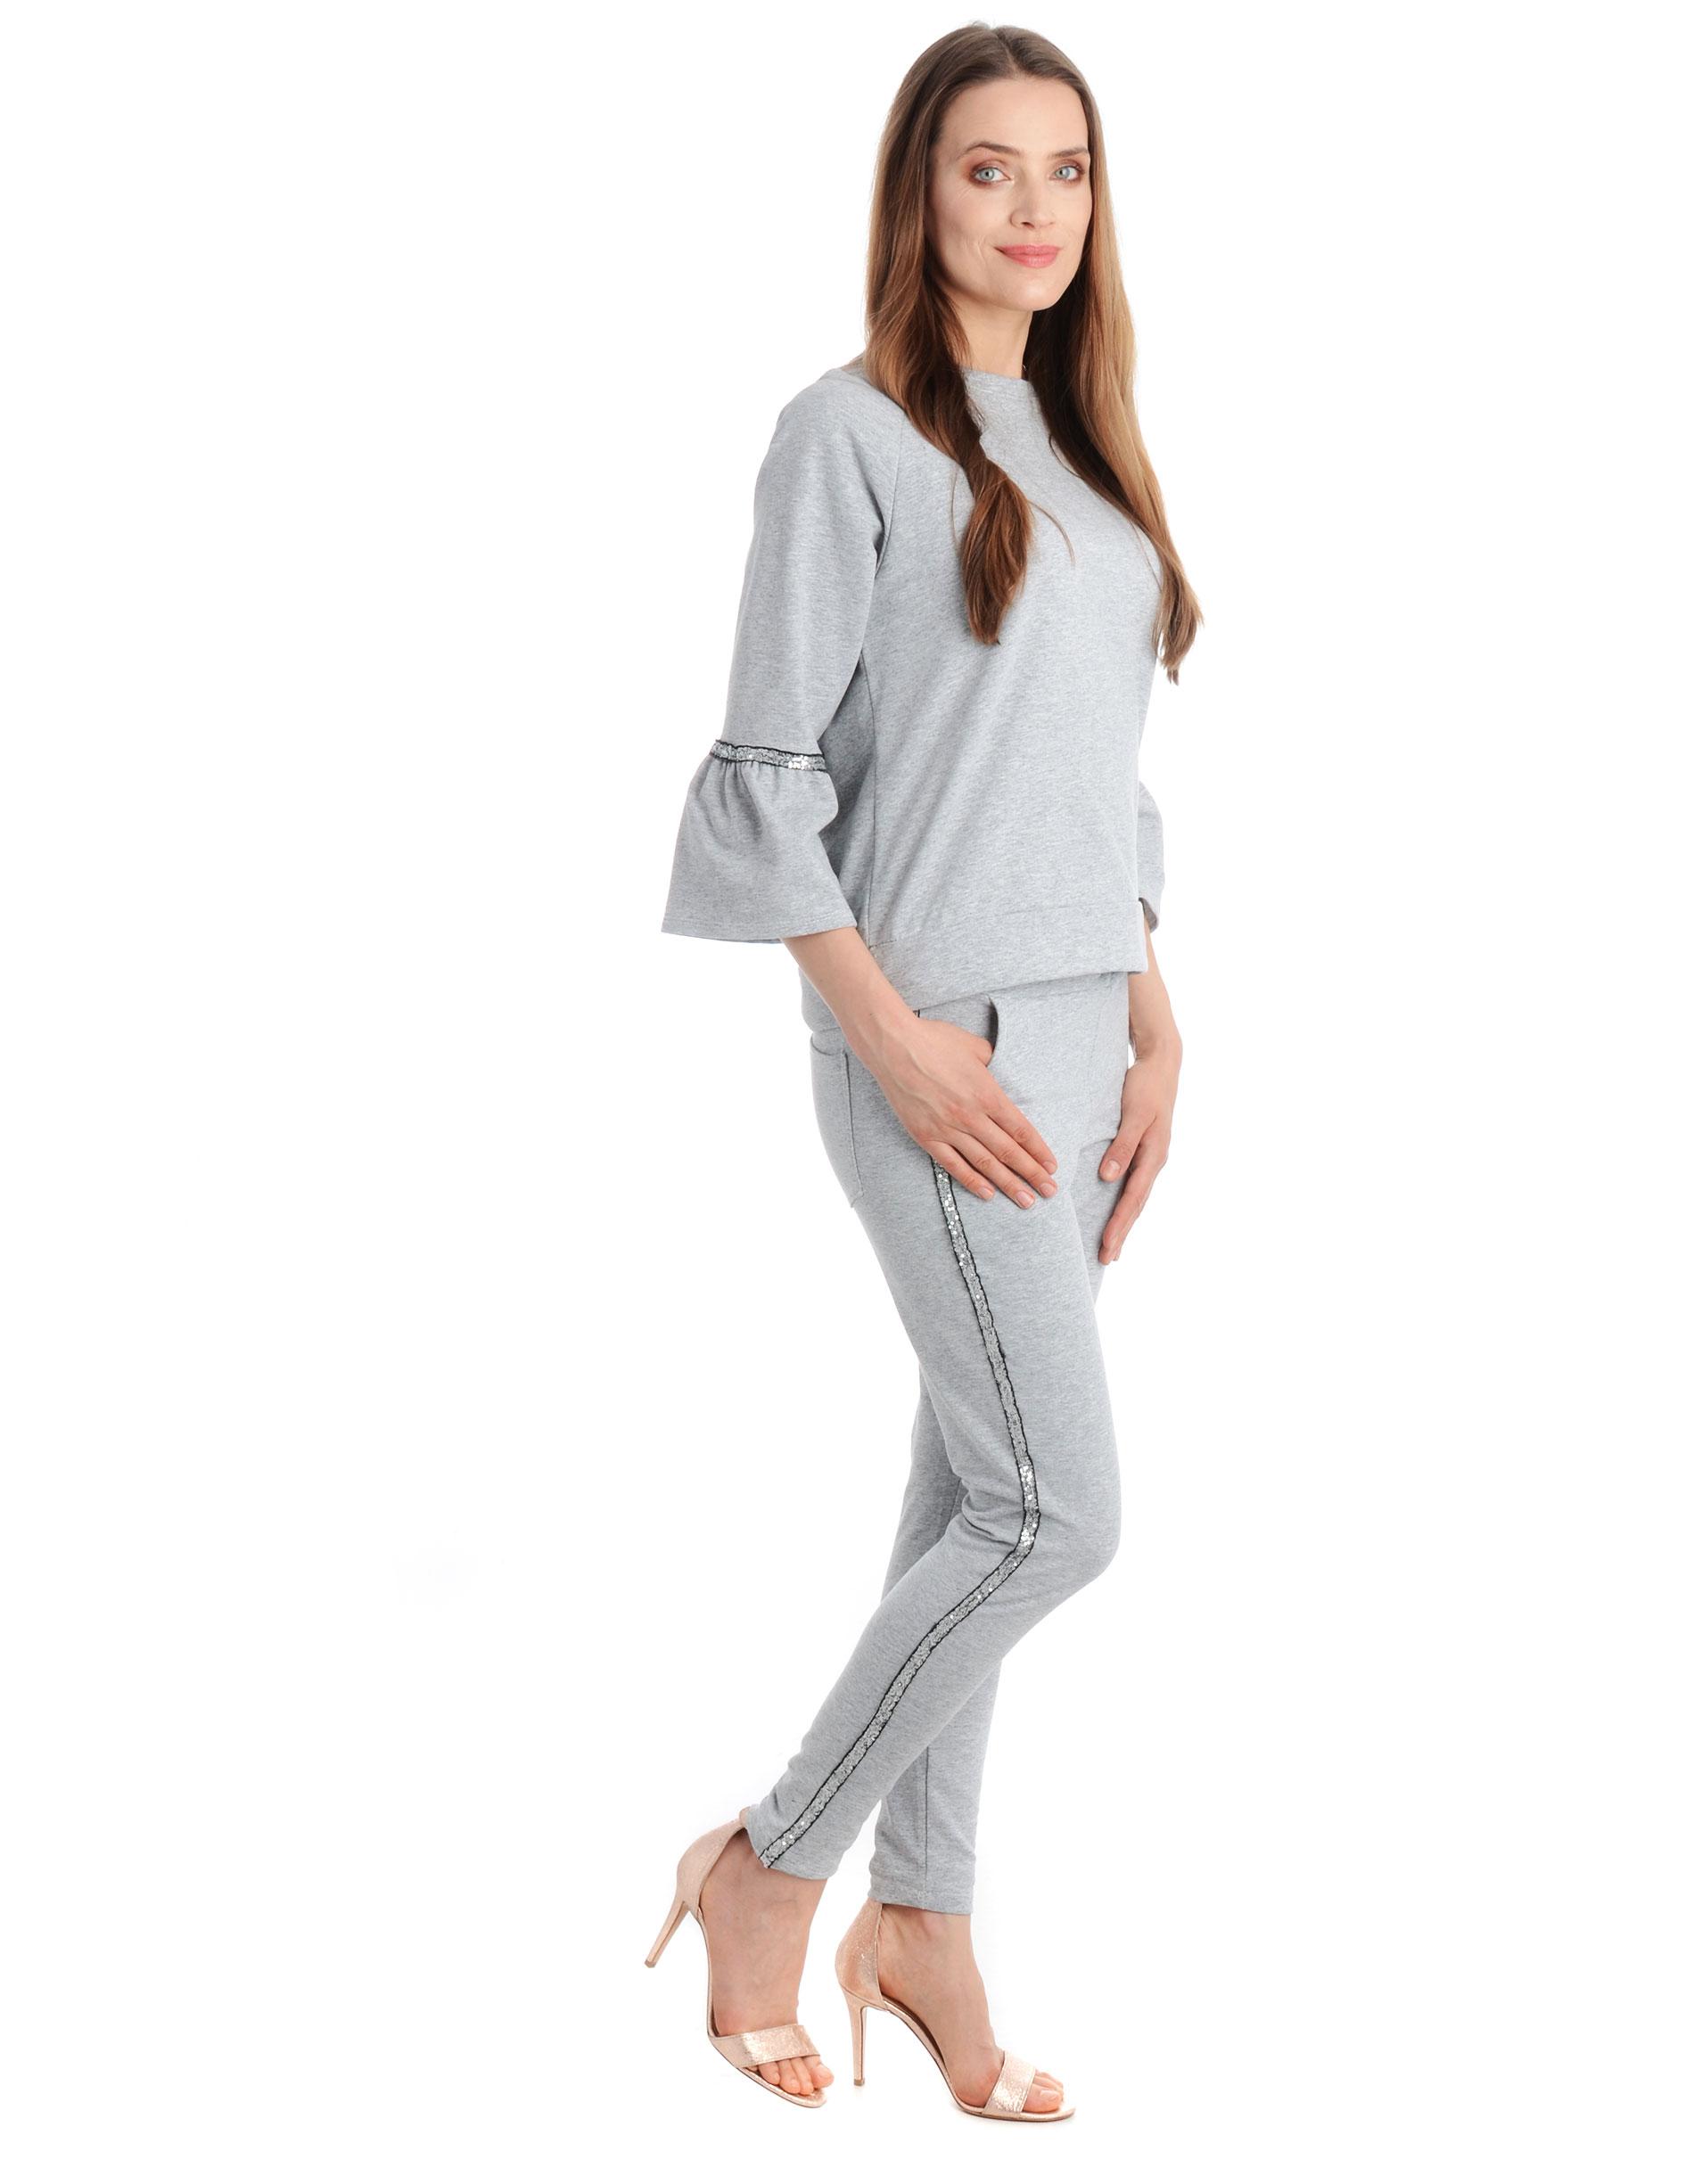 Spodnie - 90-5159 GRIGI - Unisono